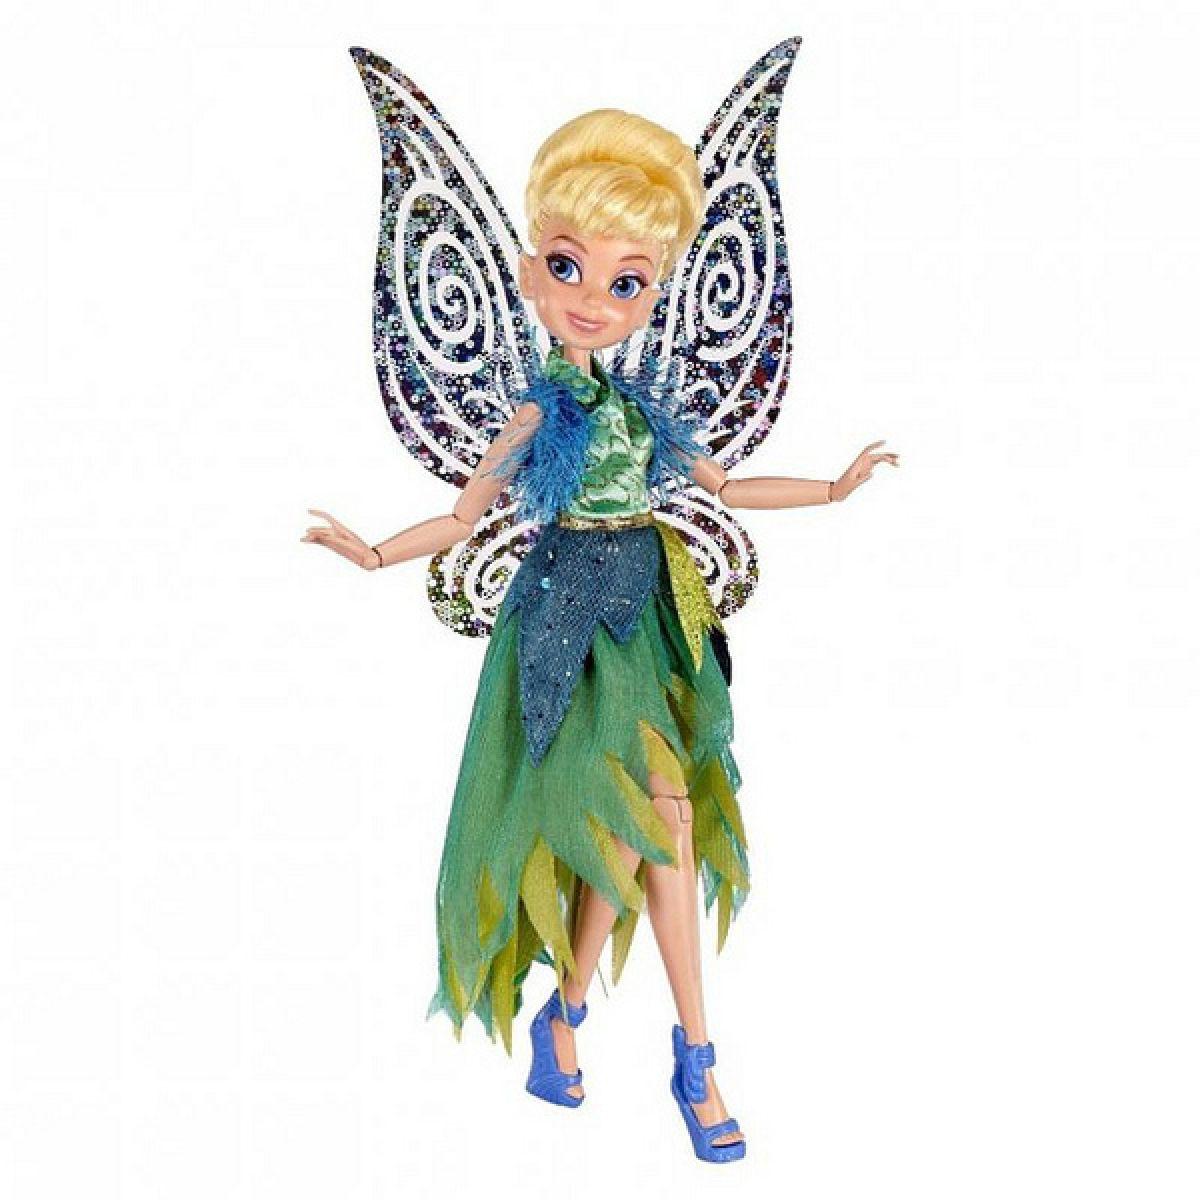 Disney Fairy 22cm Deluxe modní panenka - Tink v šatech